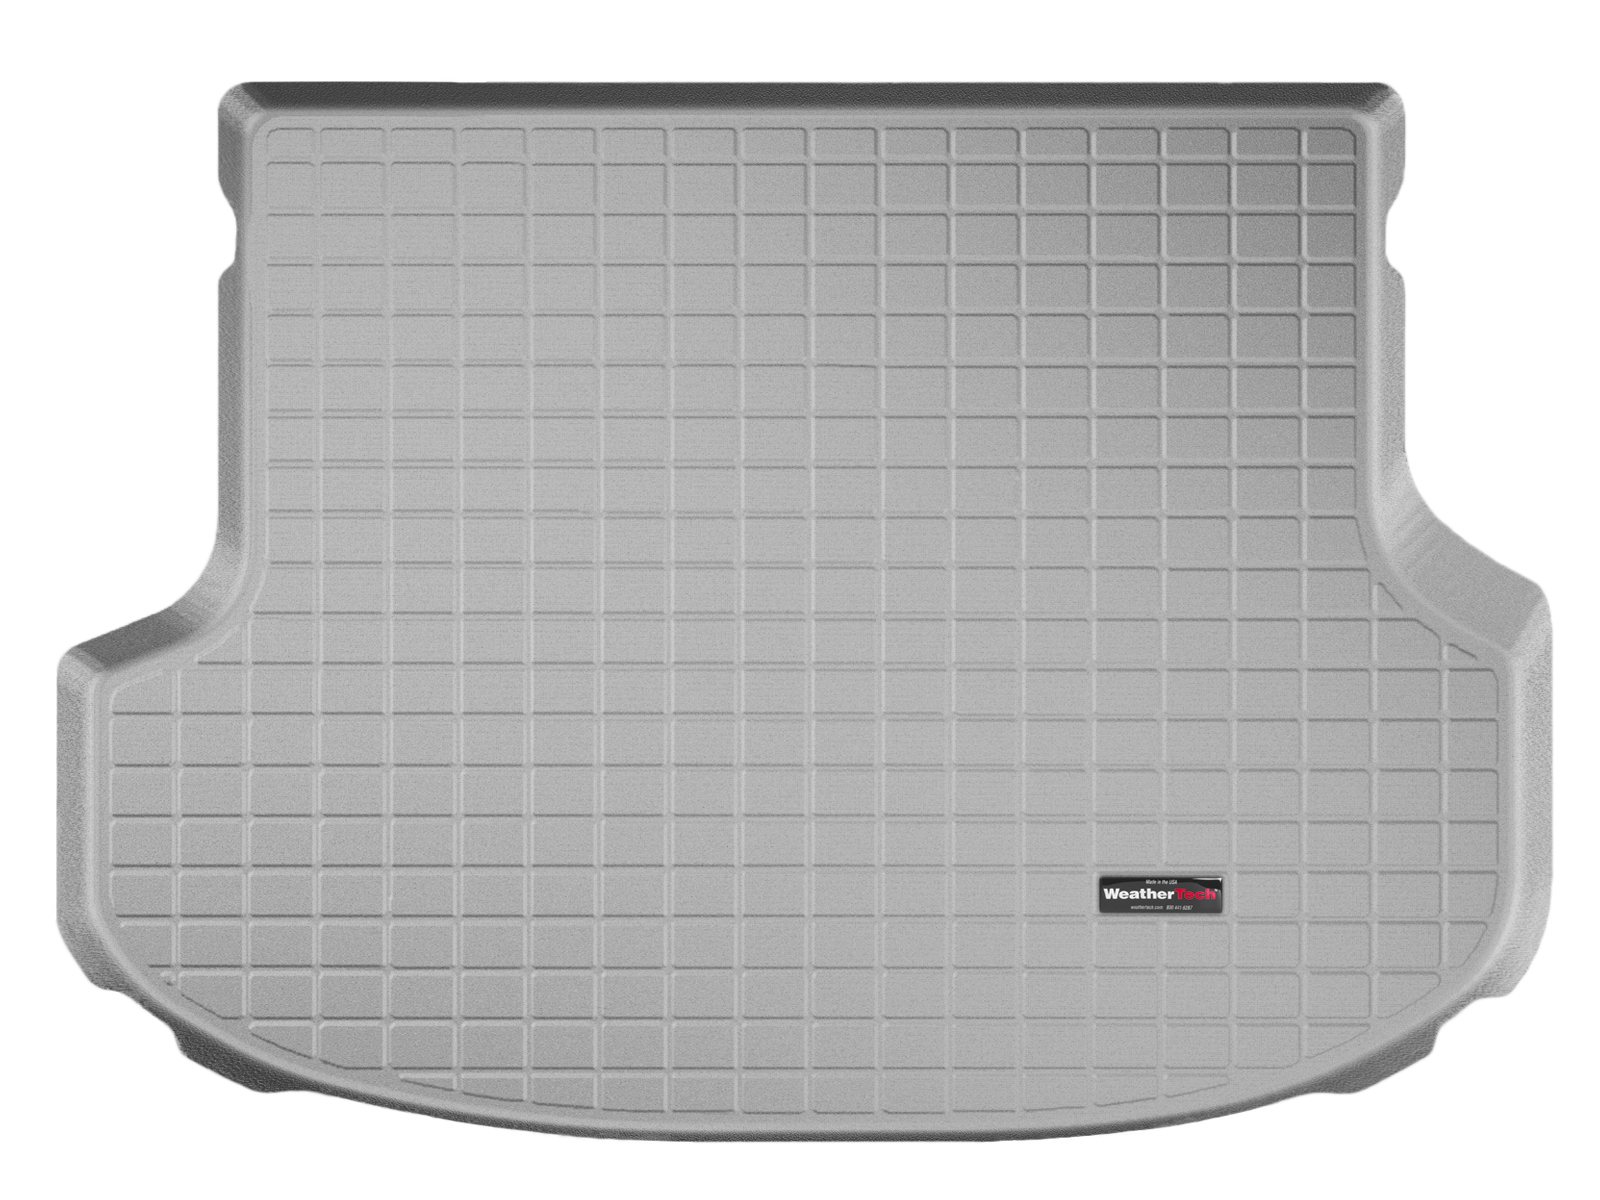 Kia Sorento 2012>2012 Vasca proteggi baule tappeto bagagliaio grigio *672